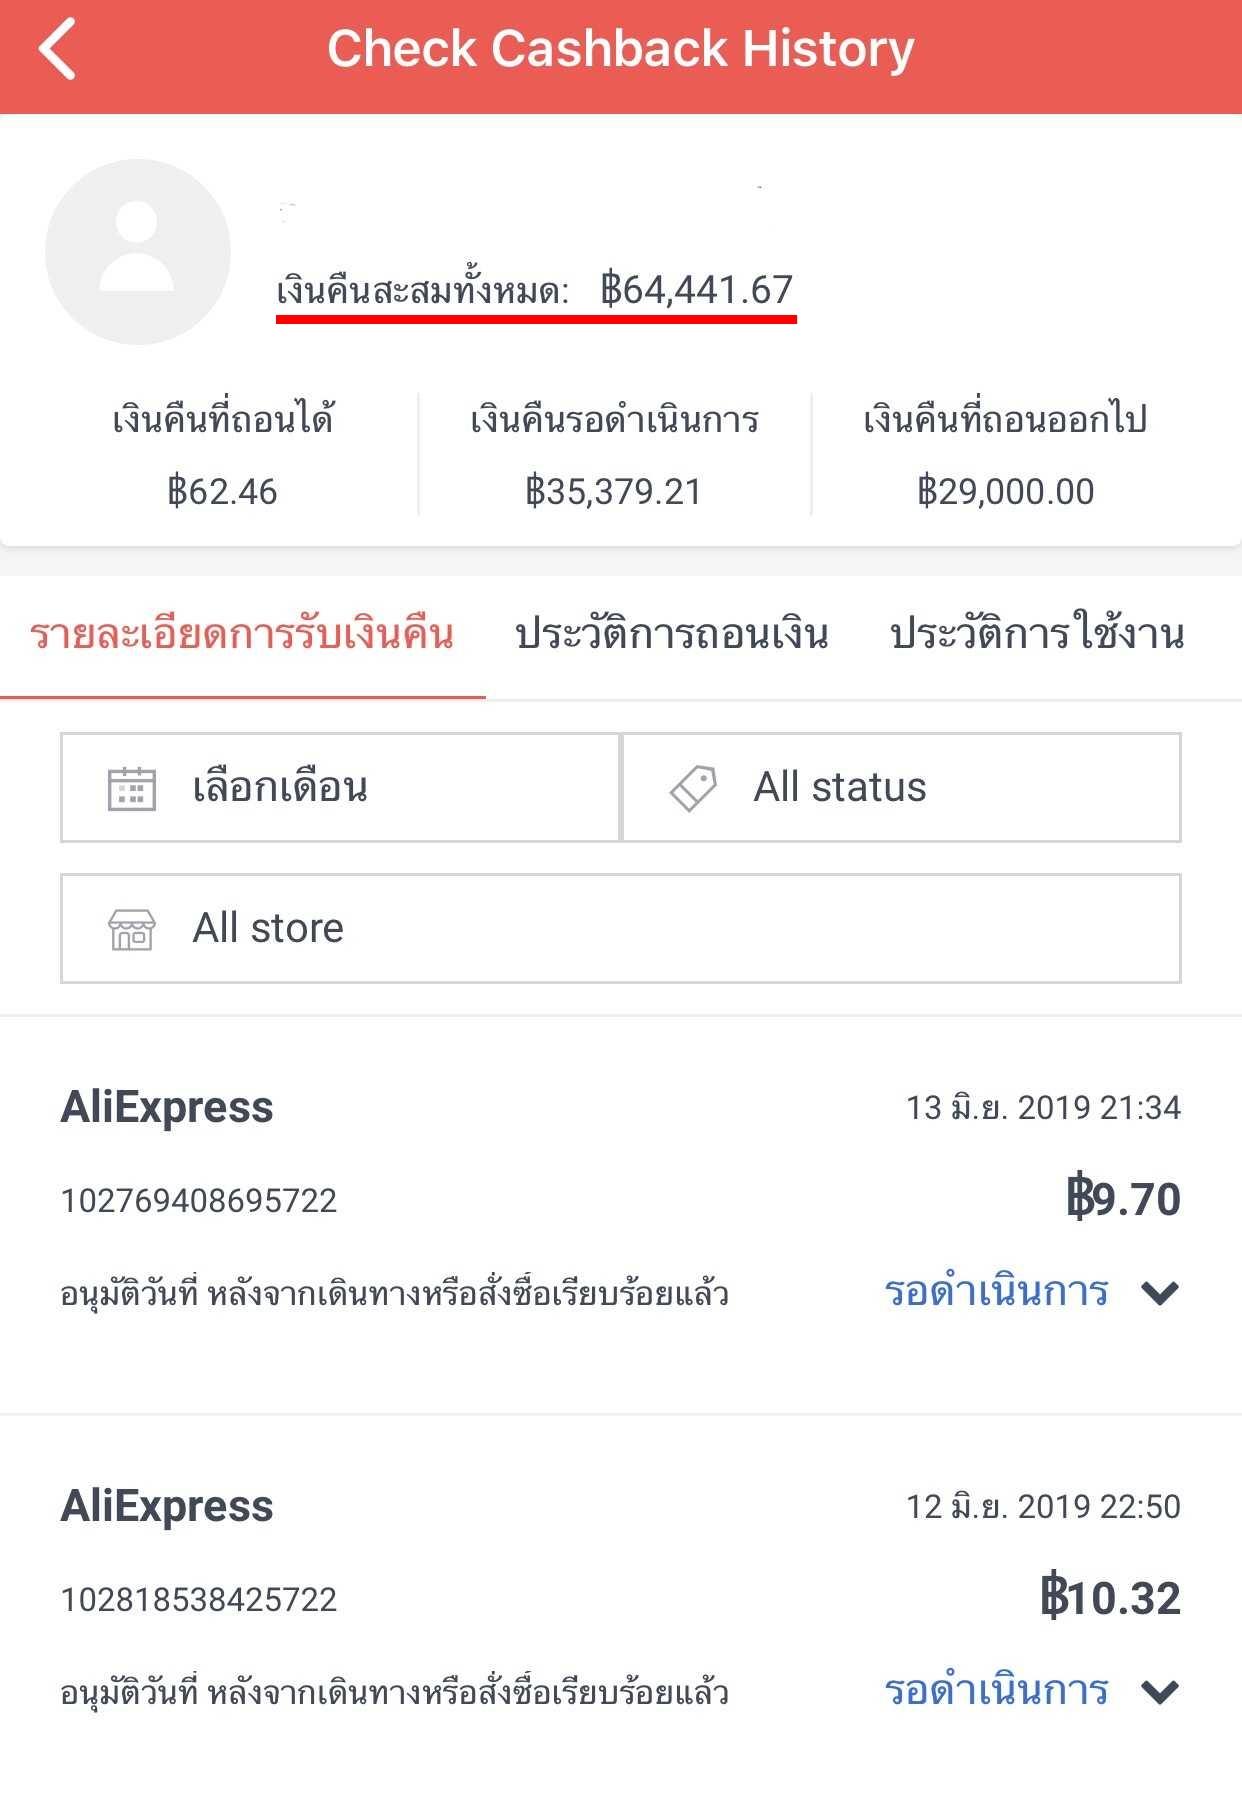 ShopBack รับเงินคืน ช้อปออนไลน์ เงินคืน ShopBack